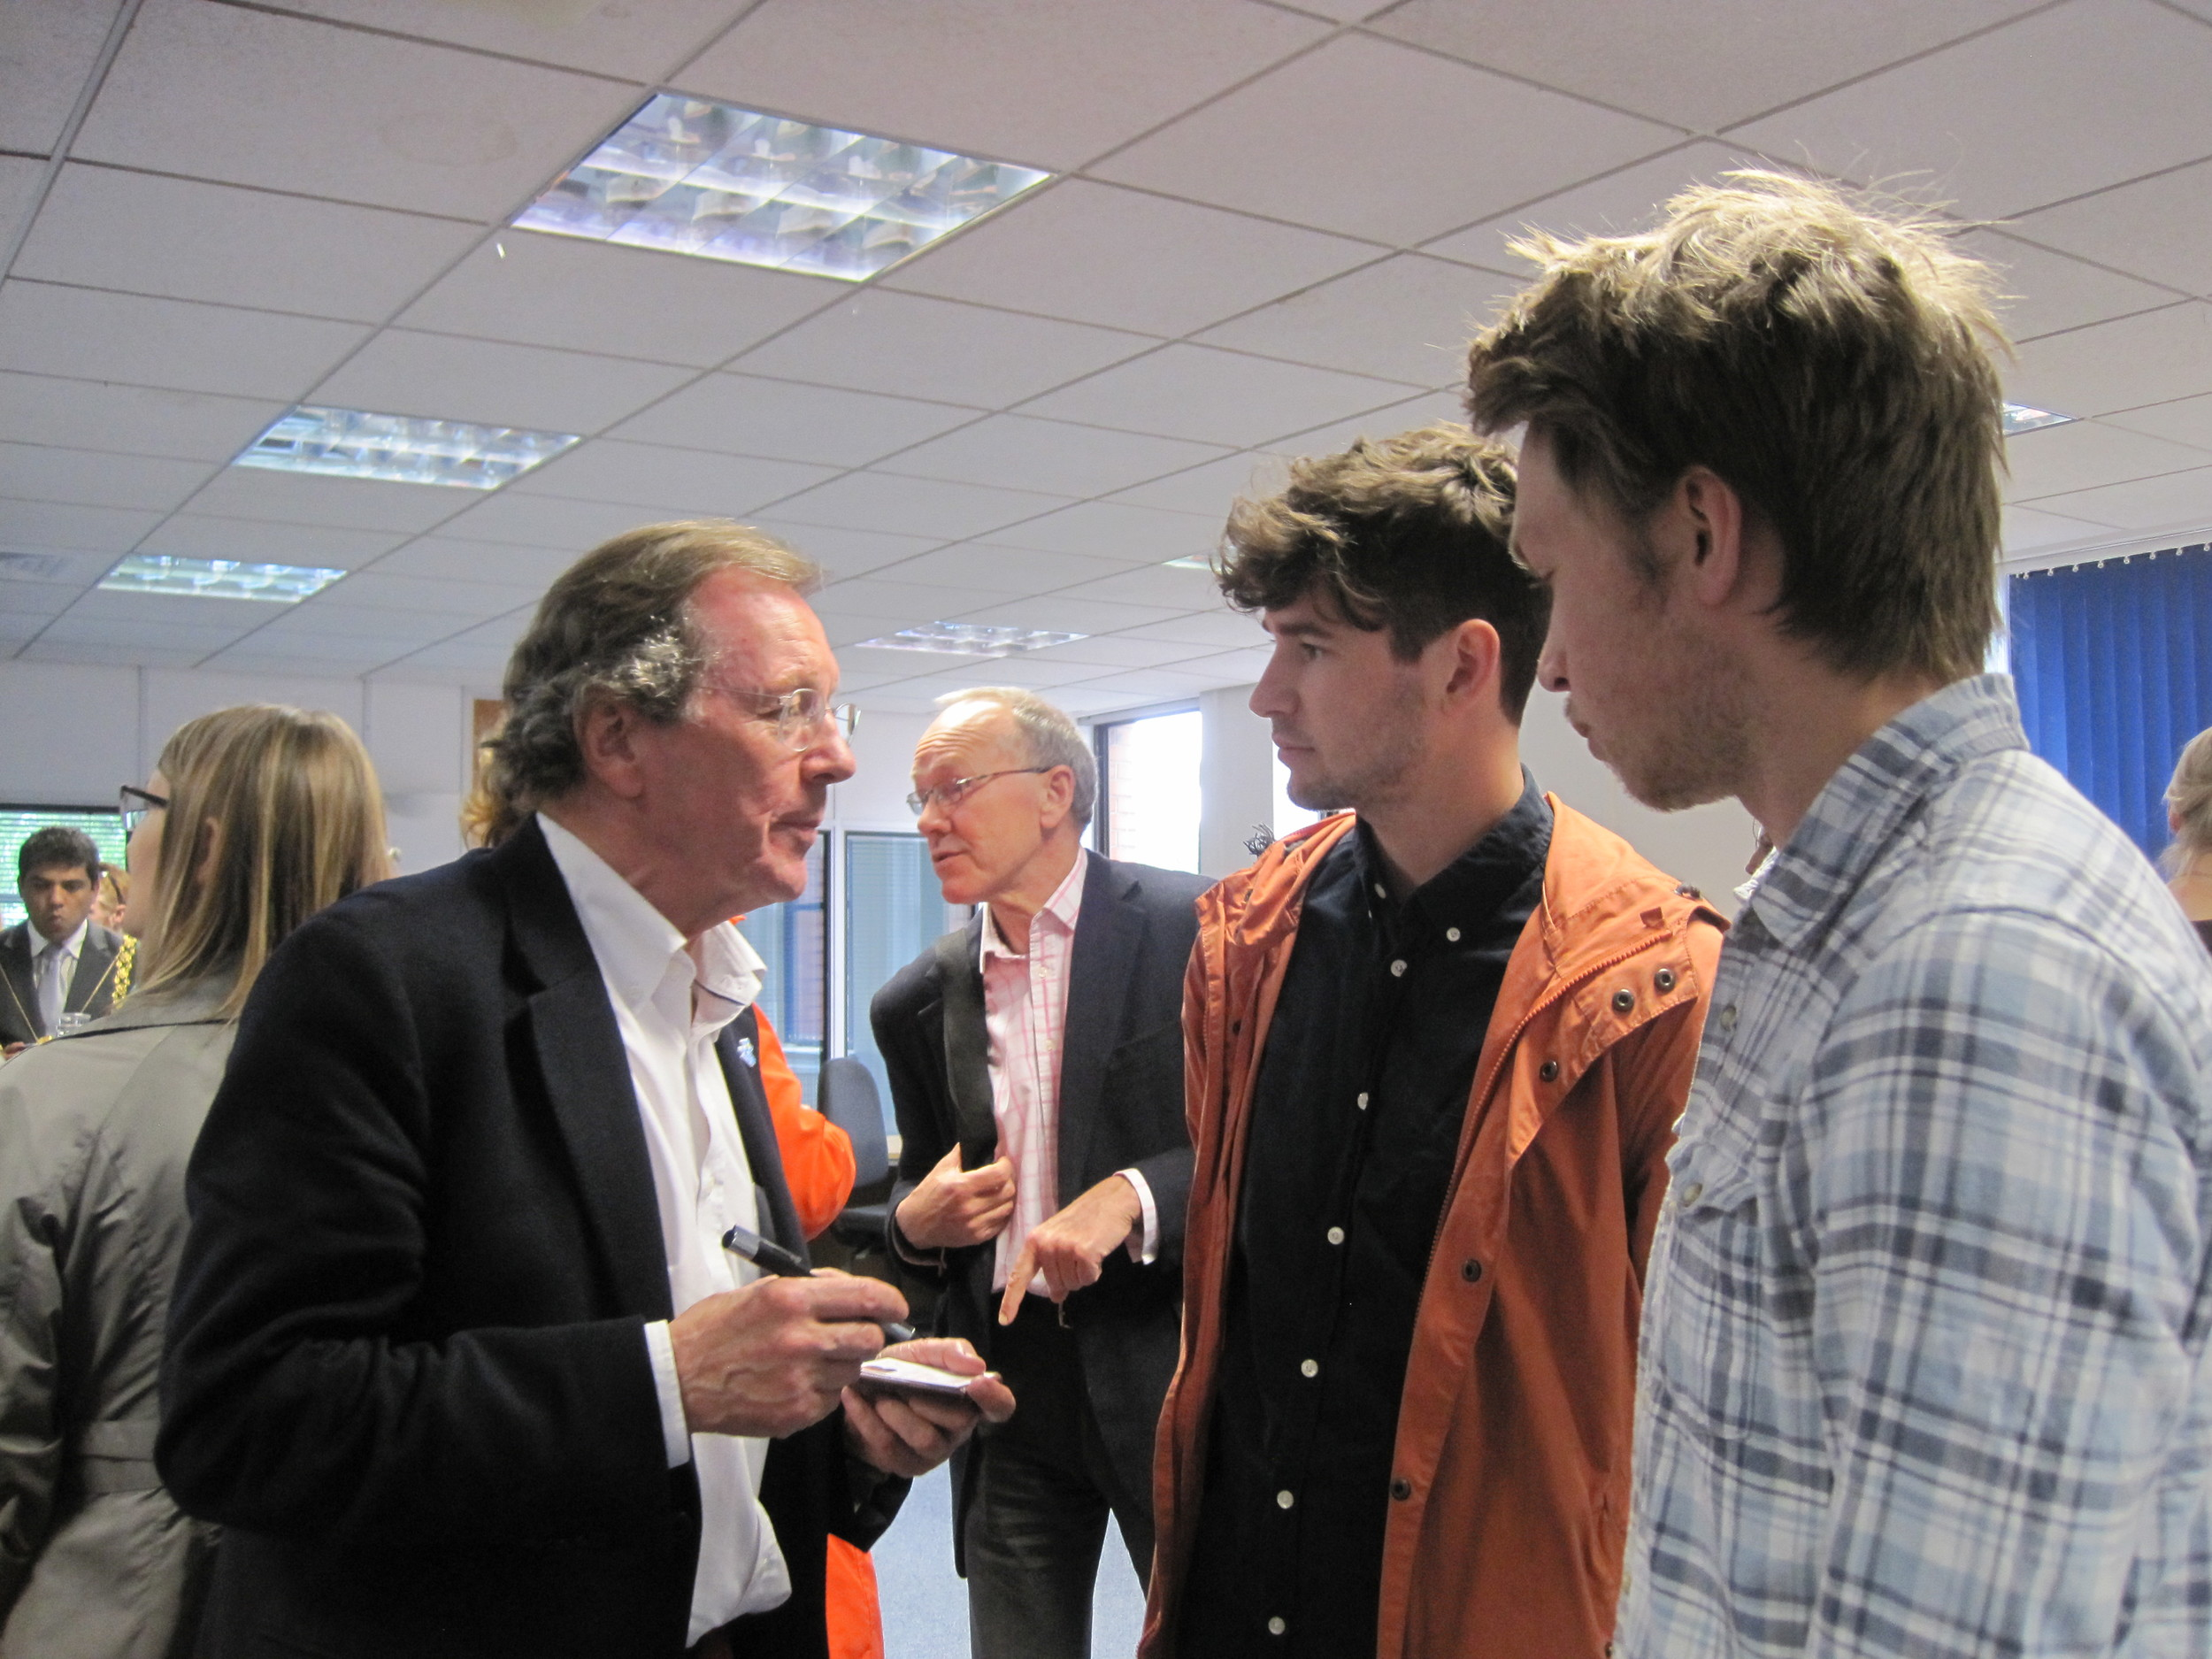 Joe and Adam interview the mayor